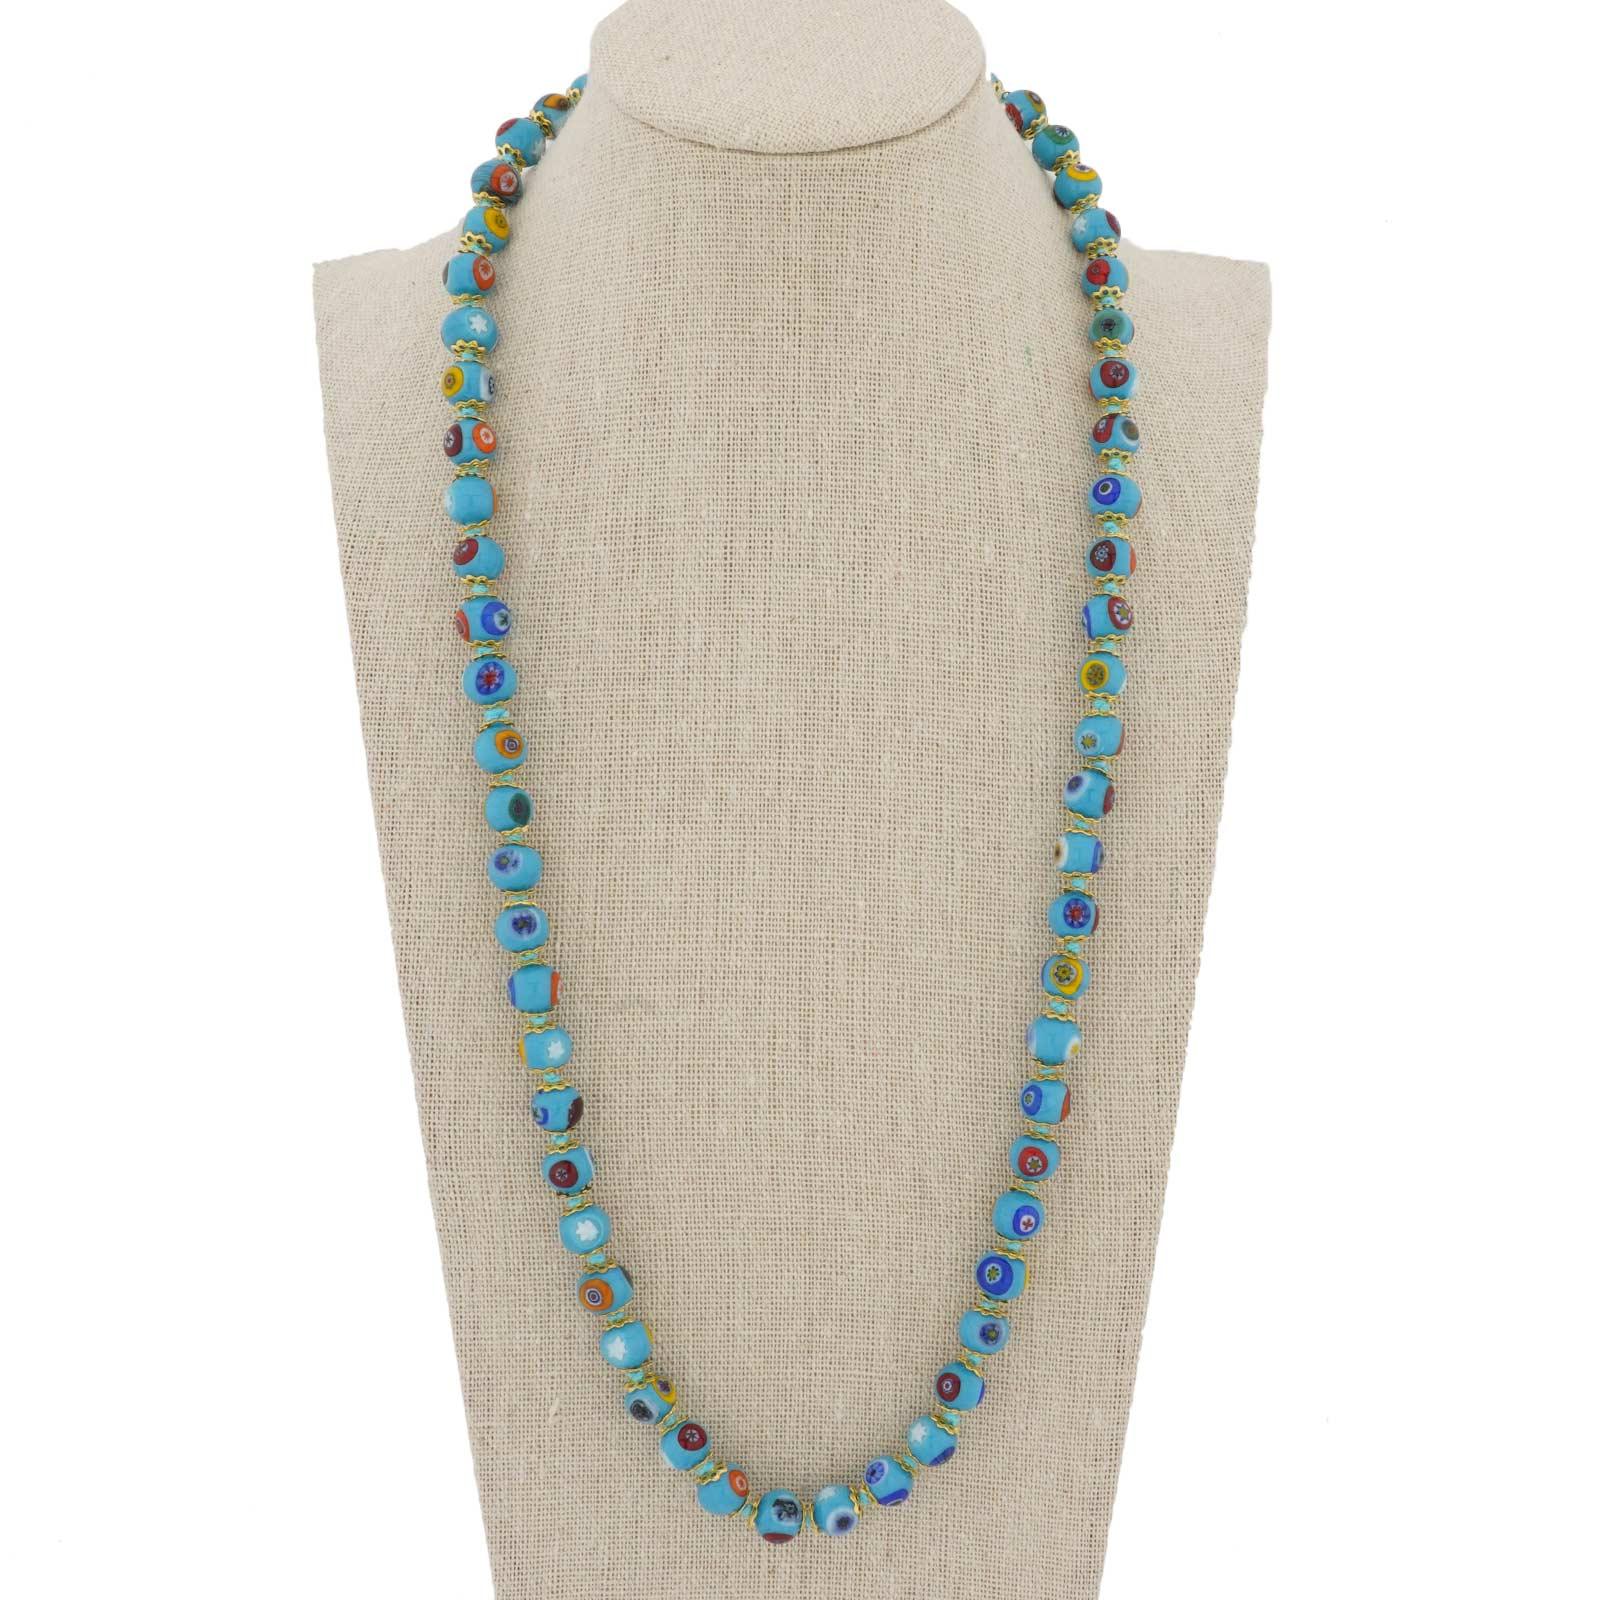 Murano Mosaic Long Necklace - Aqua